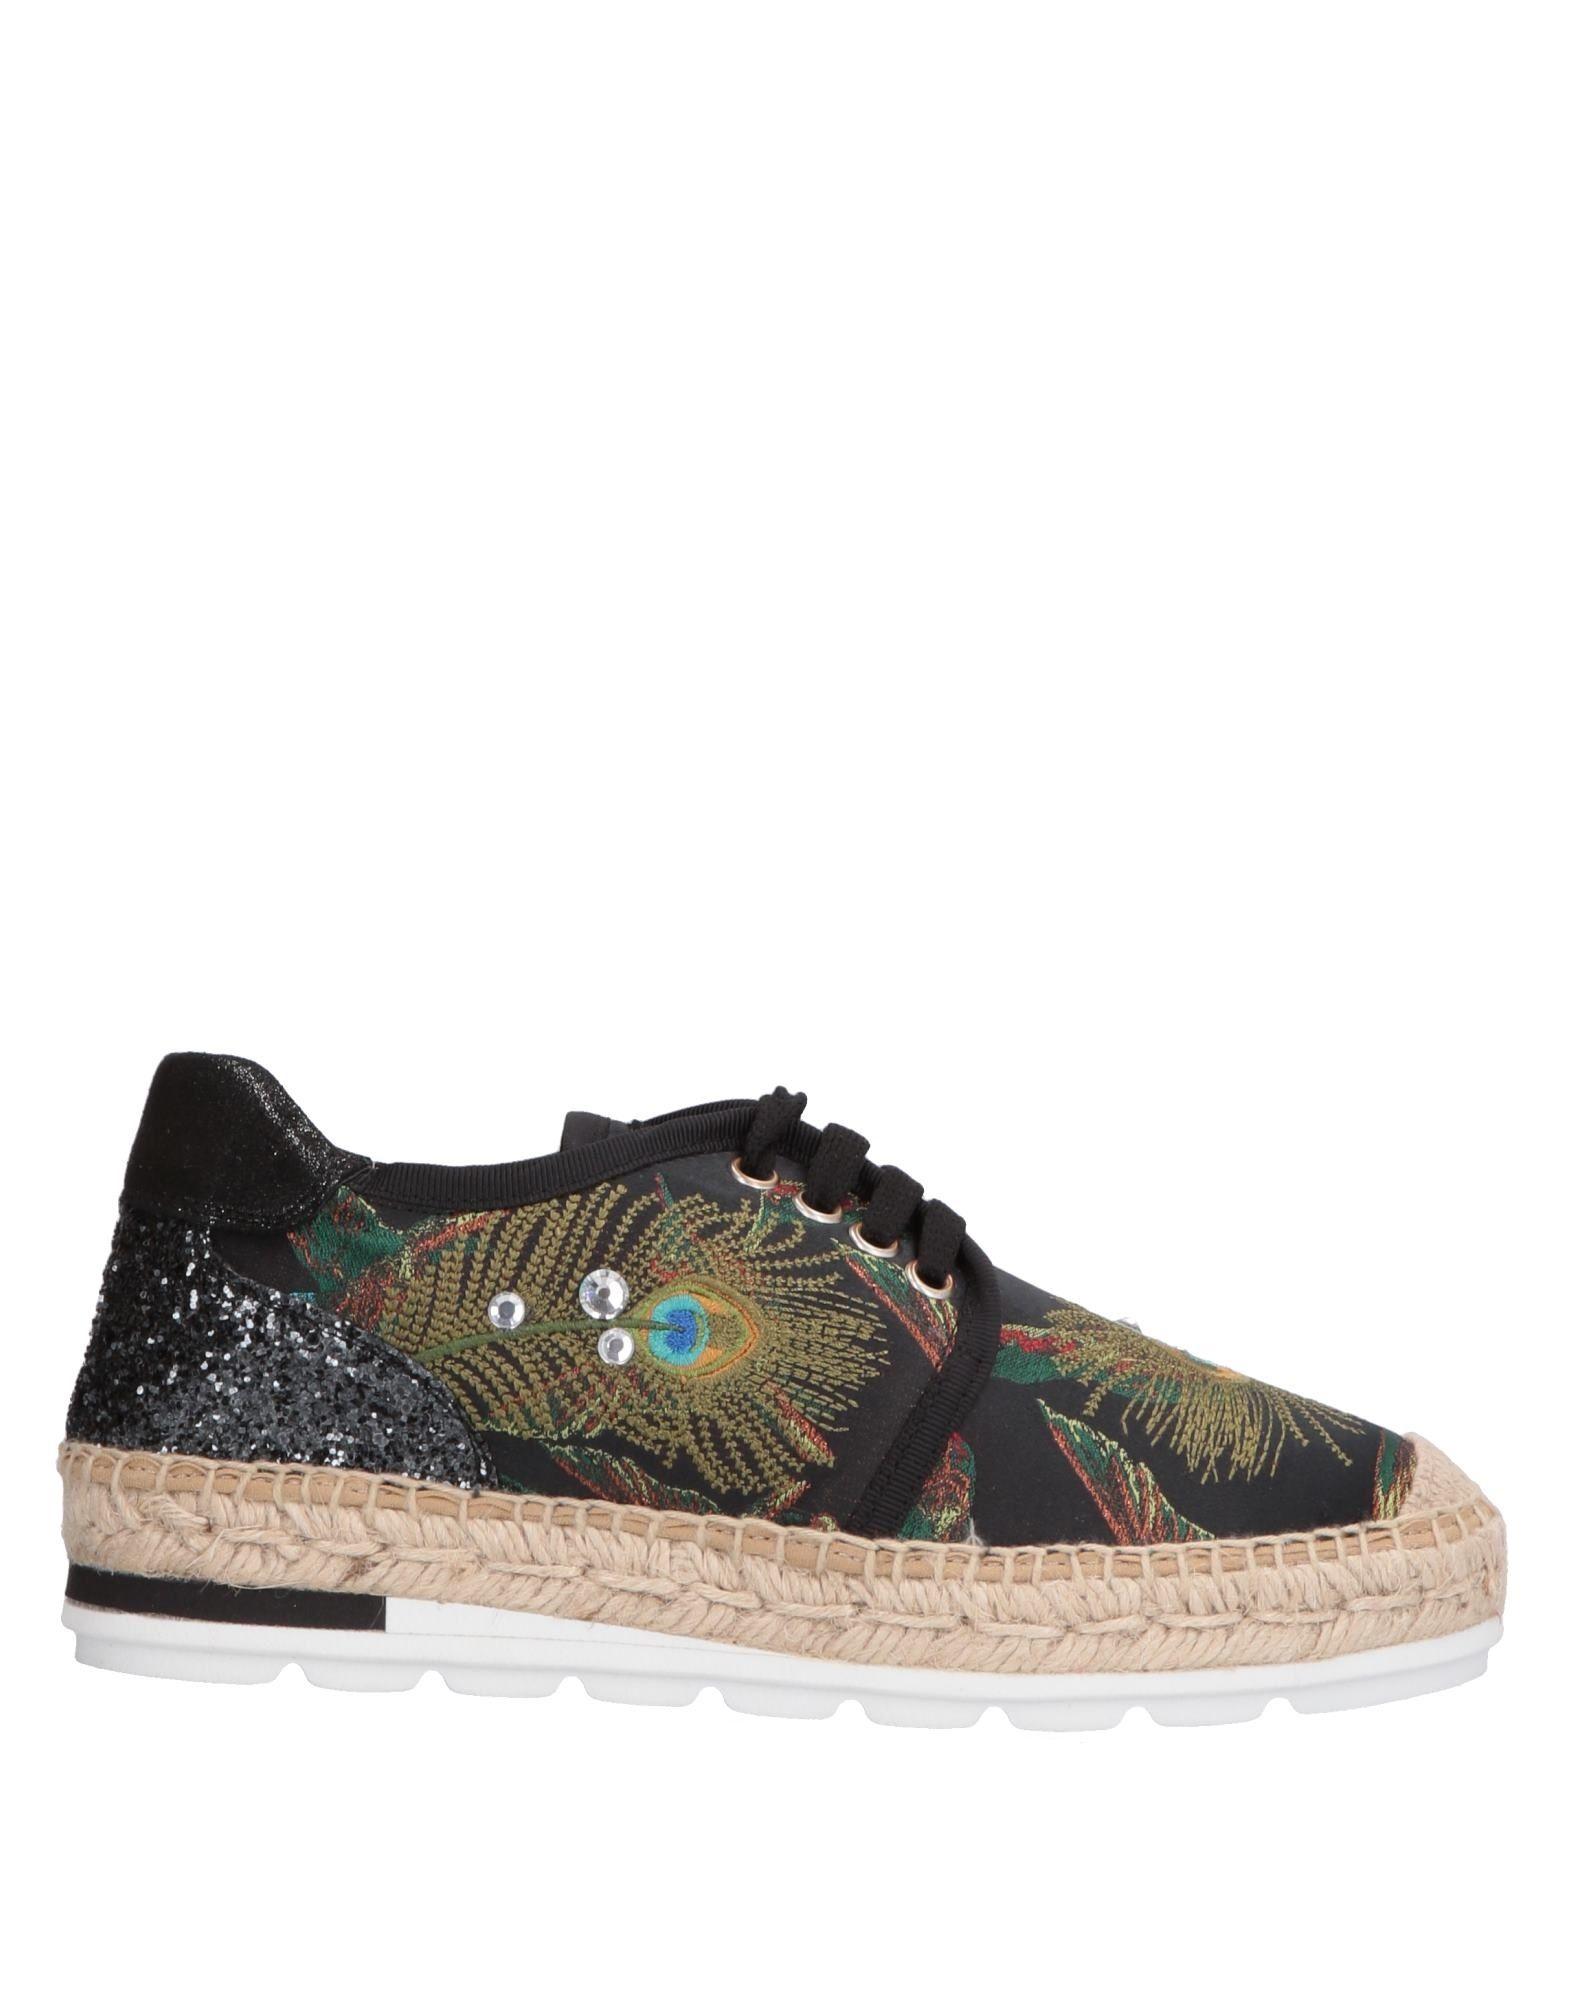 Kanna on Sneakers - Women Kanna Sneakers online on Kanna  Canada - 11570721VS 6d4fc2